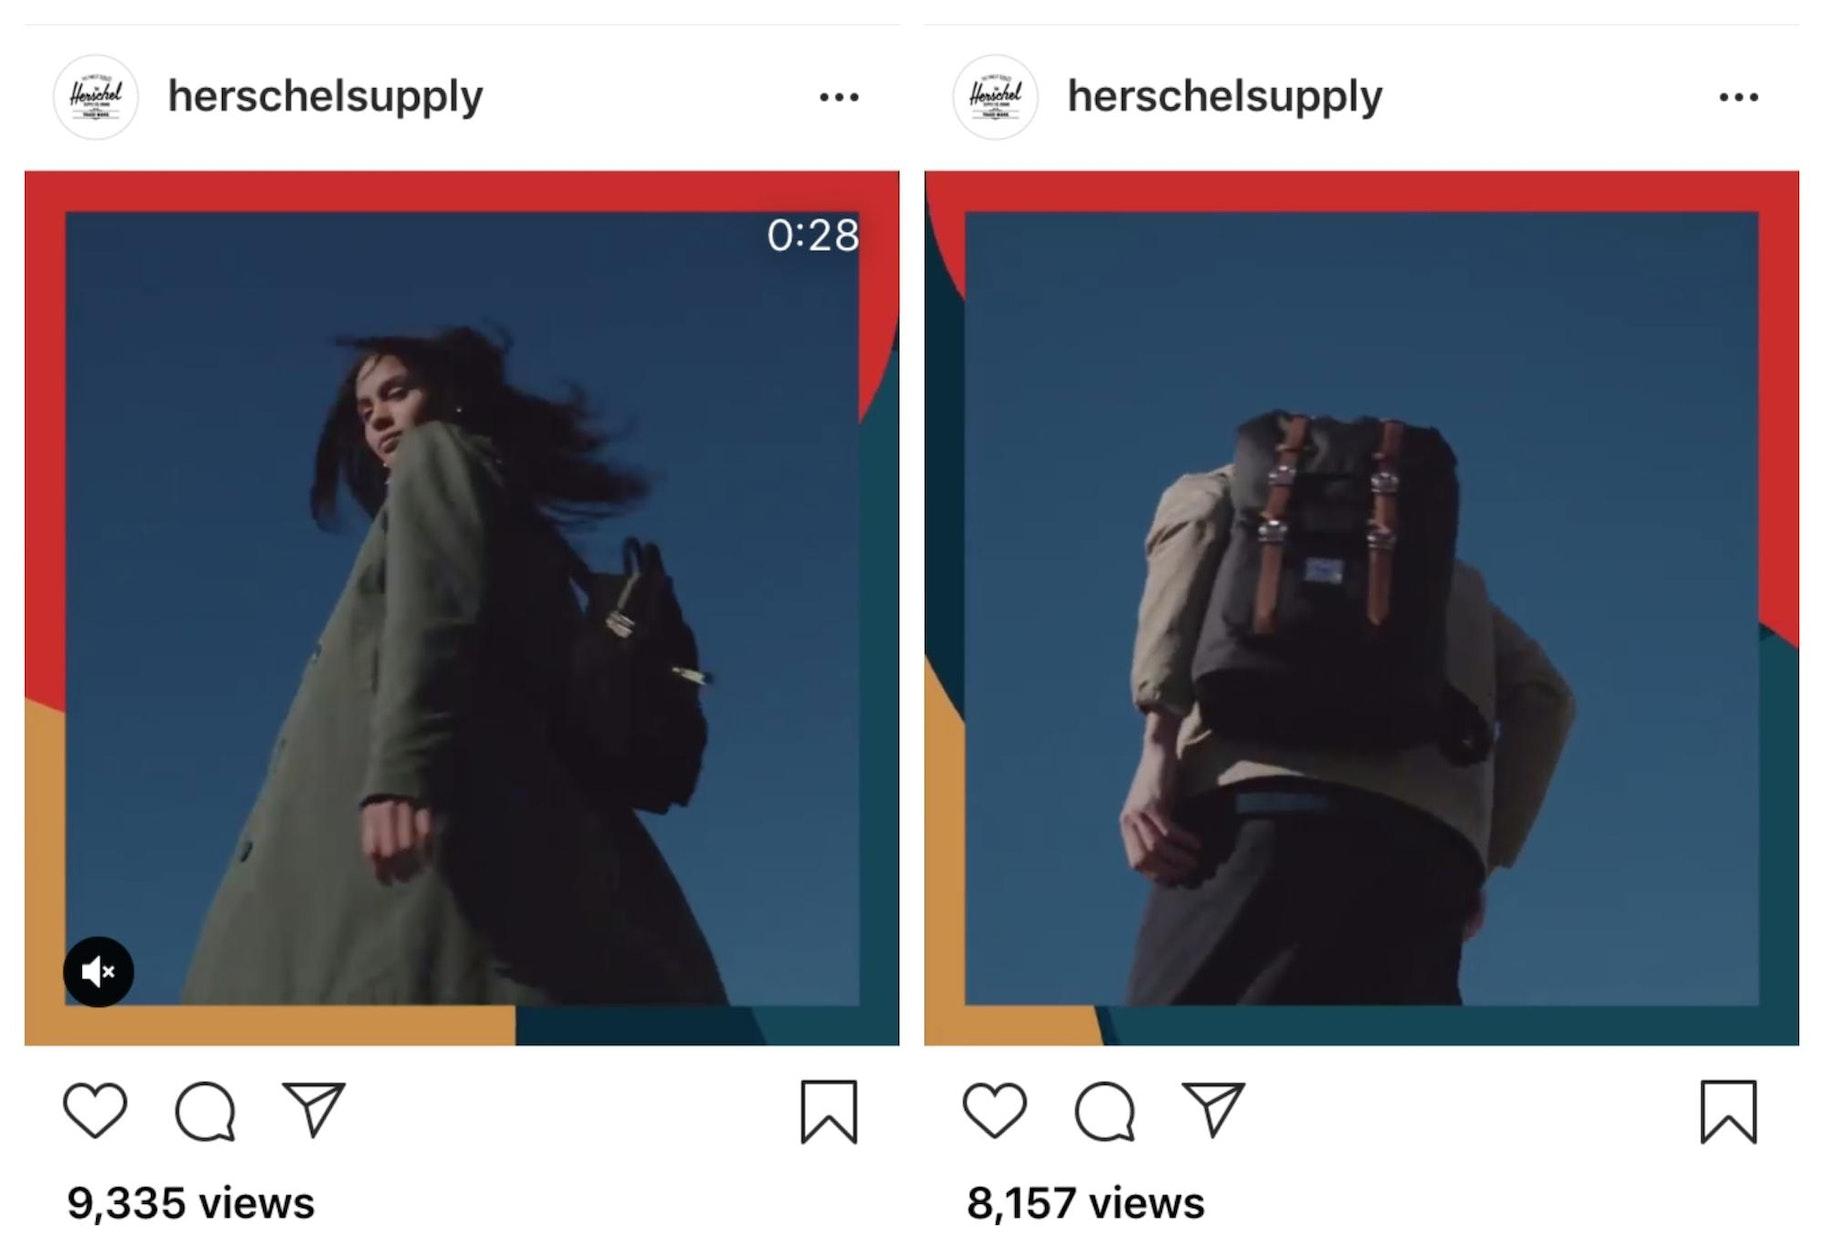 Herschel Supply Instagram Templates